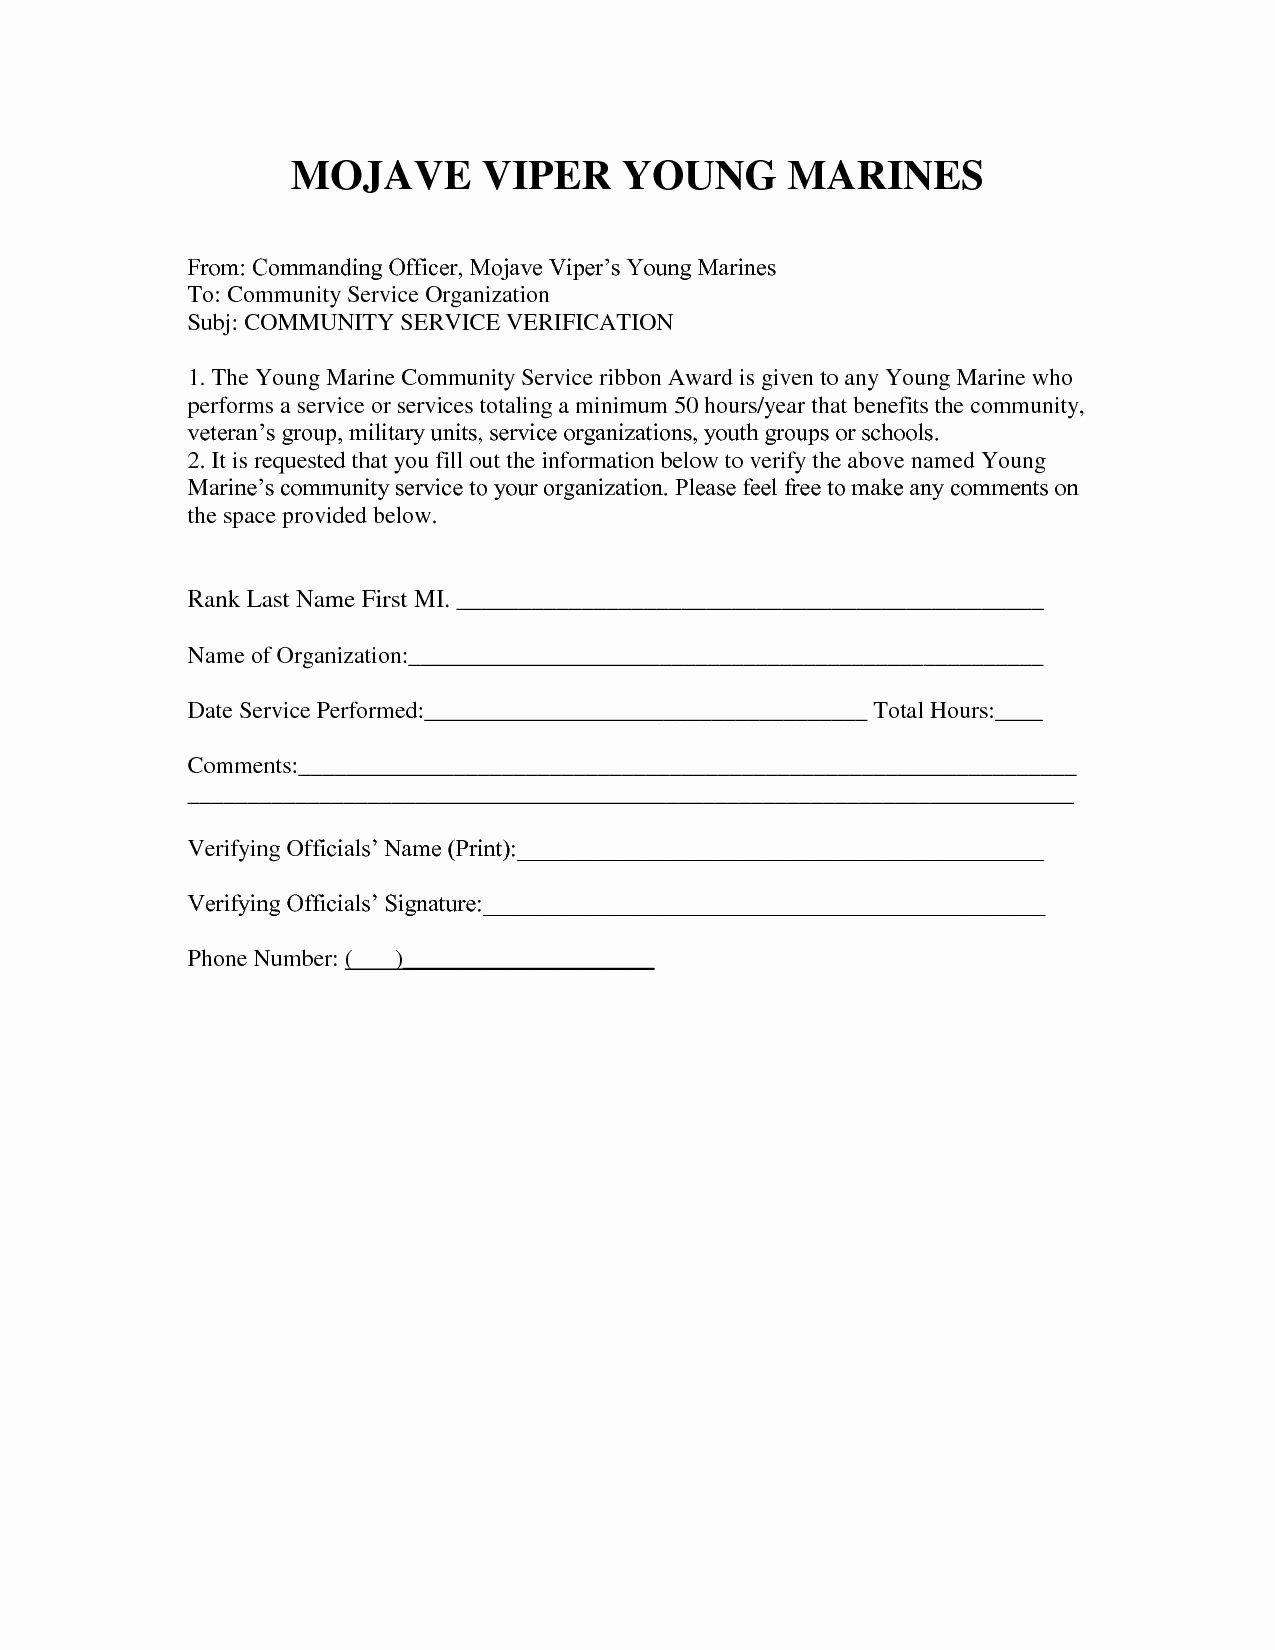 Persuasive essay on community service